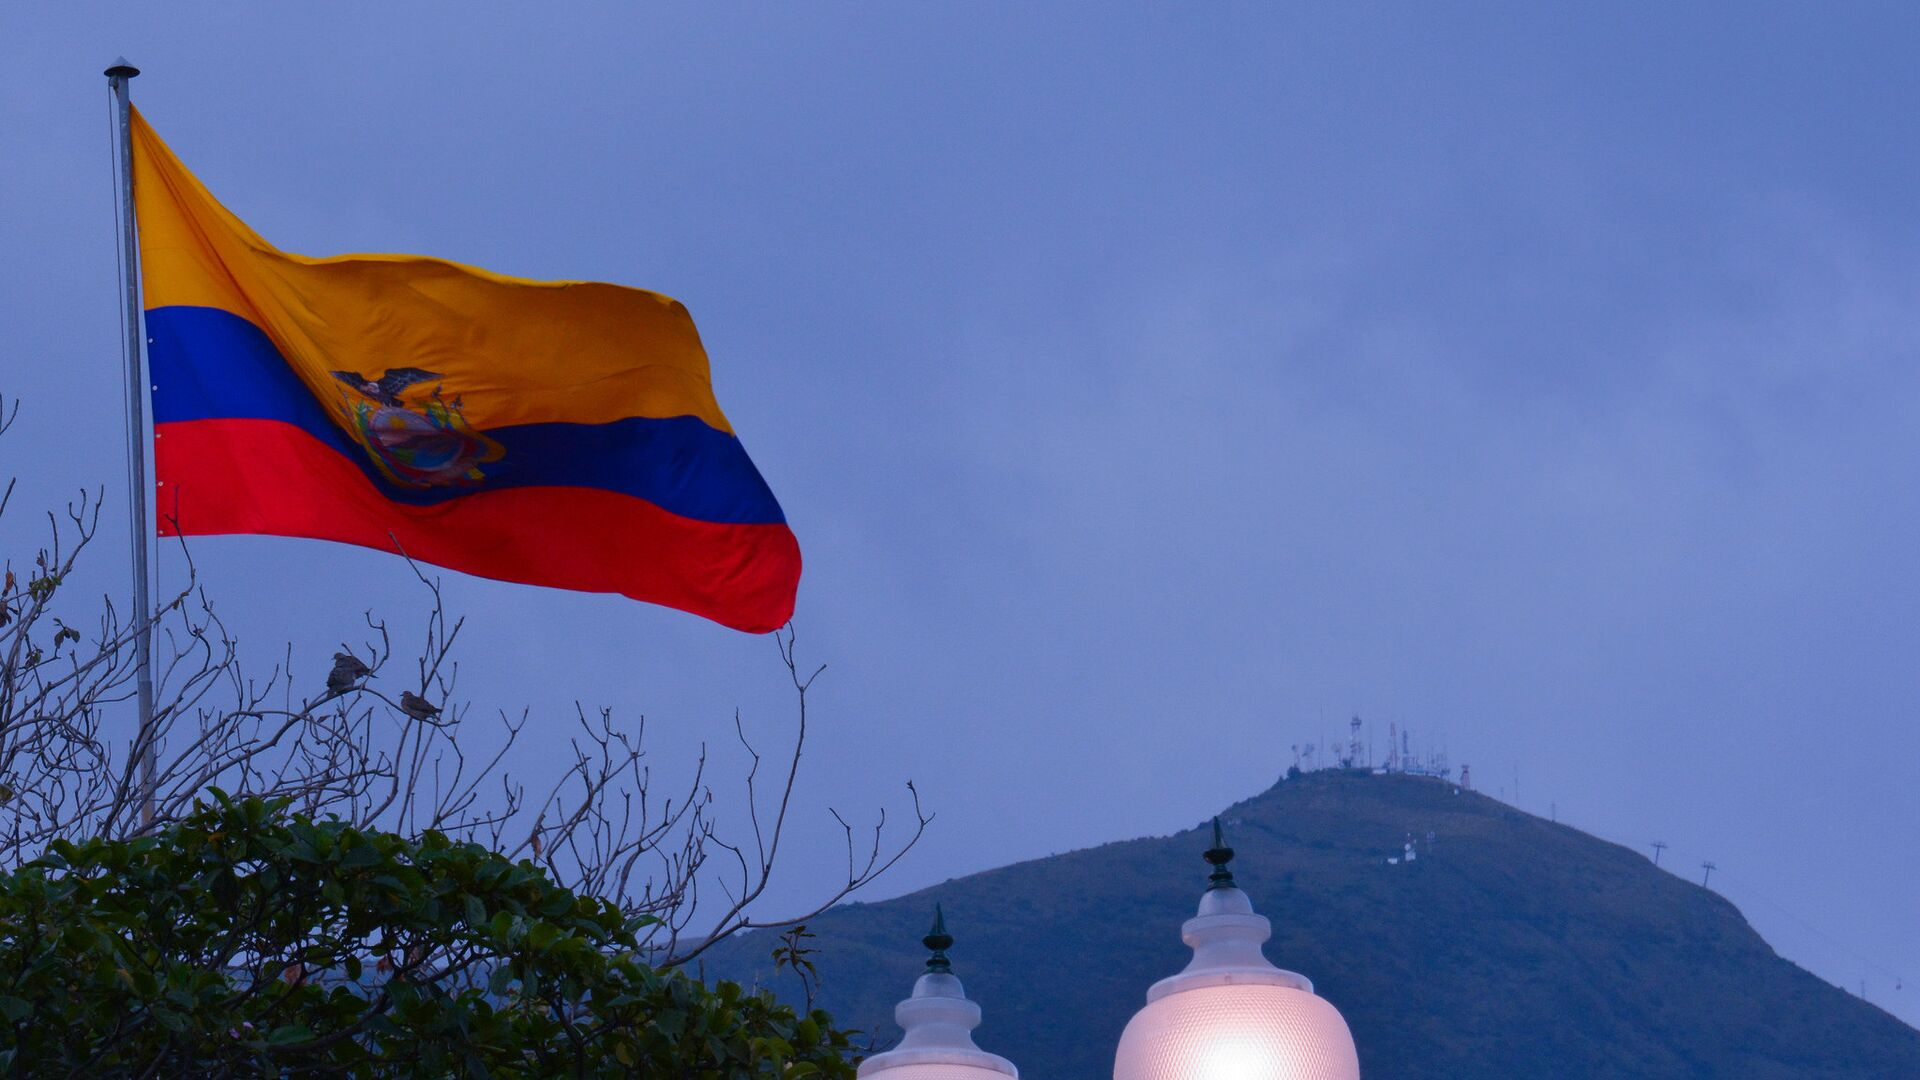 La bandera de Ecuador - Sputnik Mundo, 1920, 17.08.2021